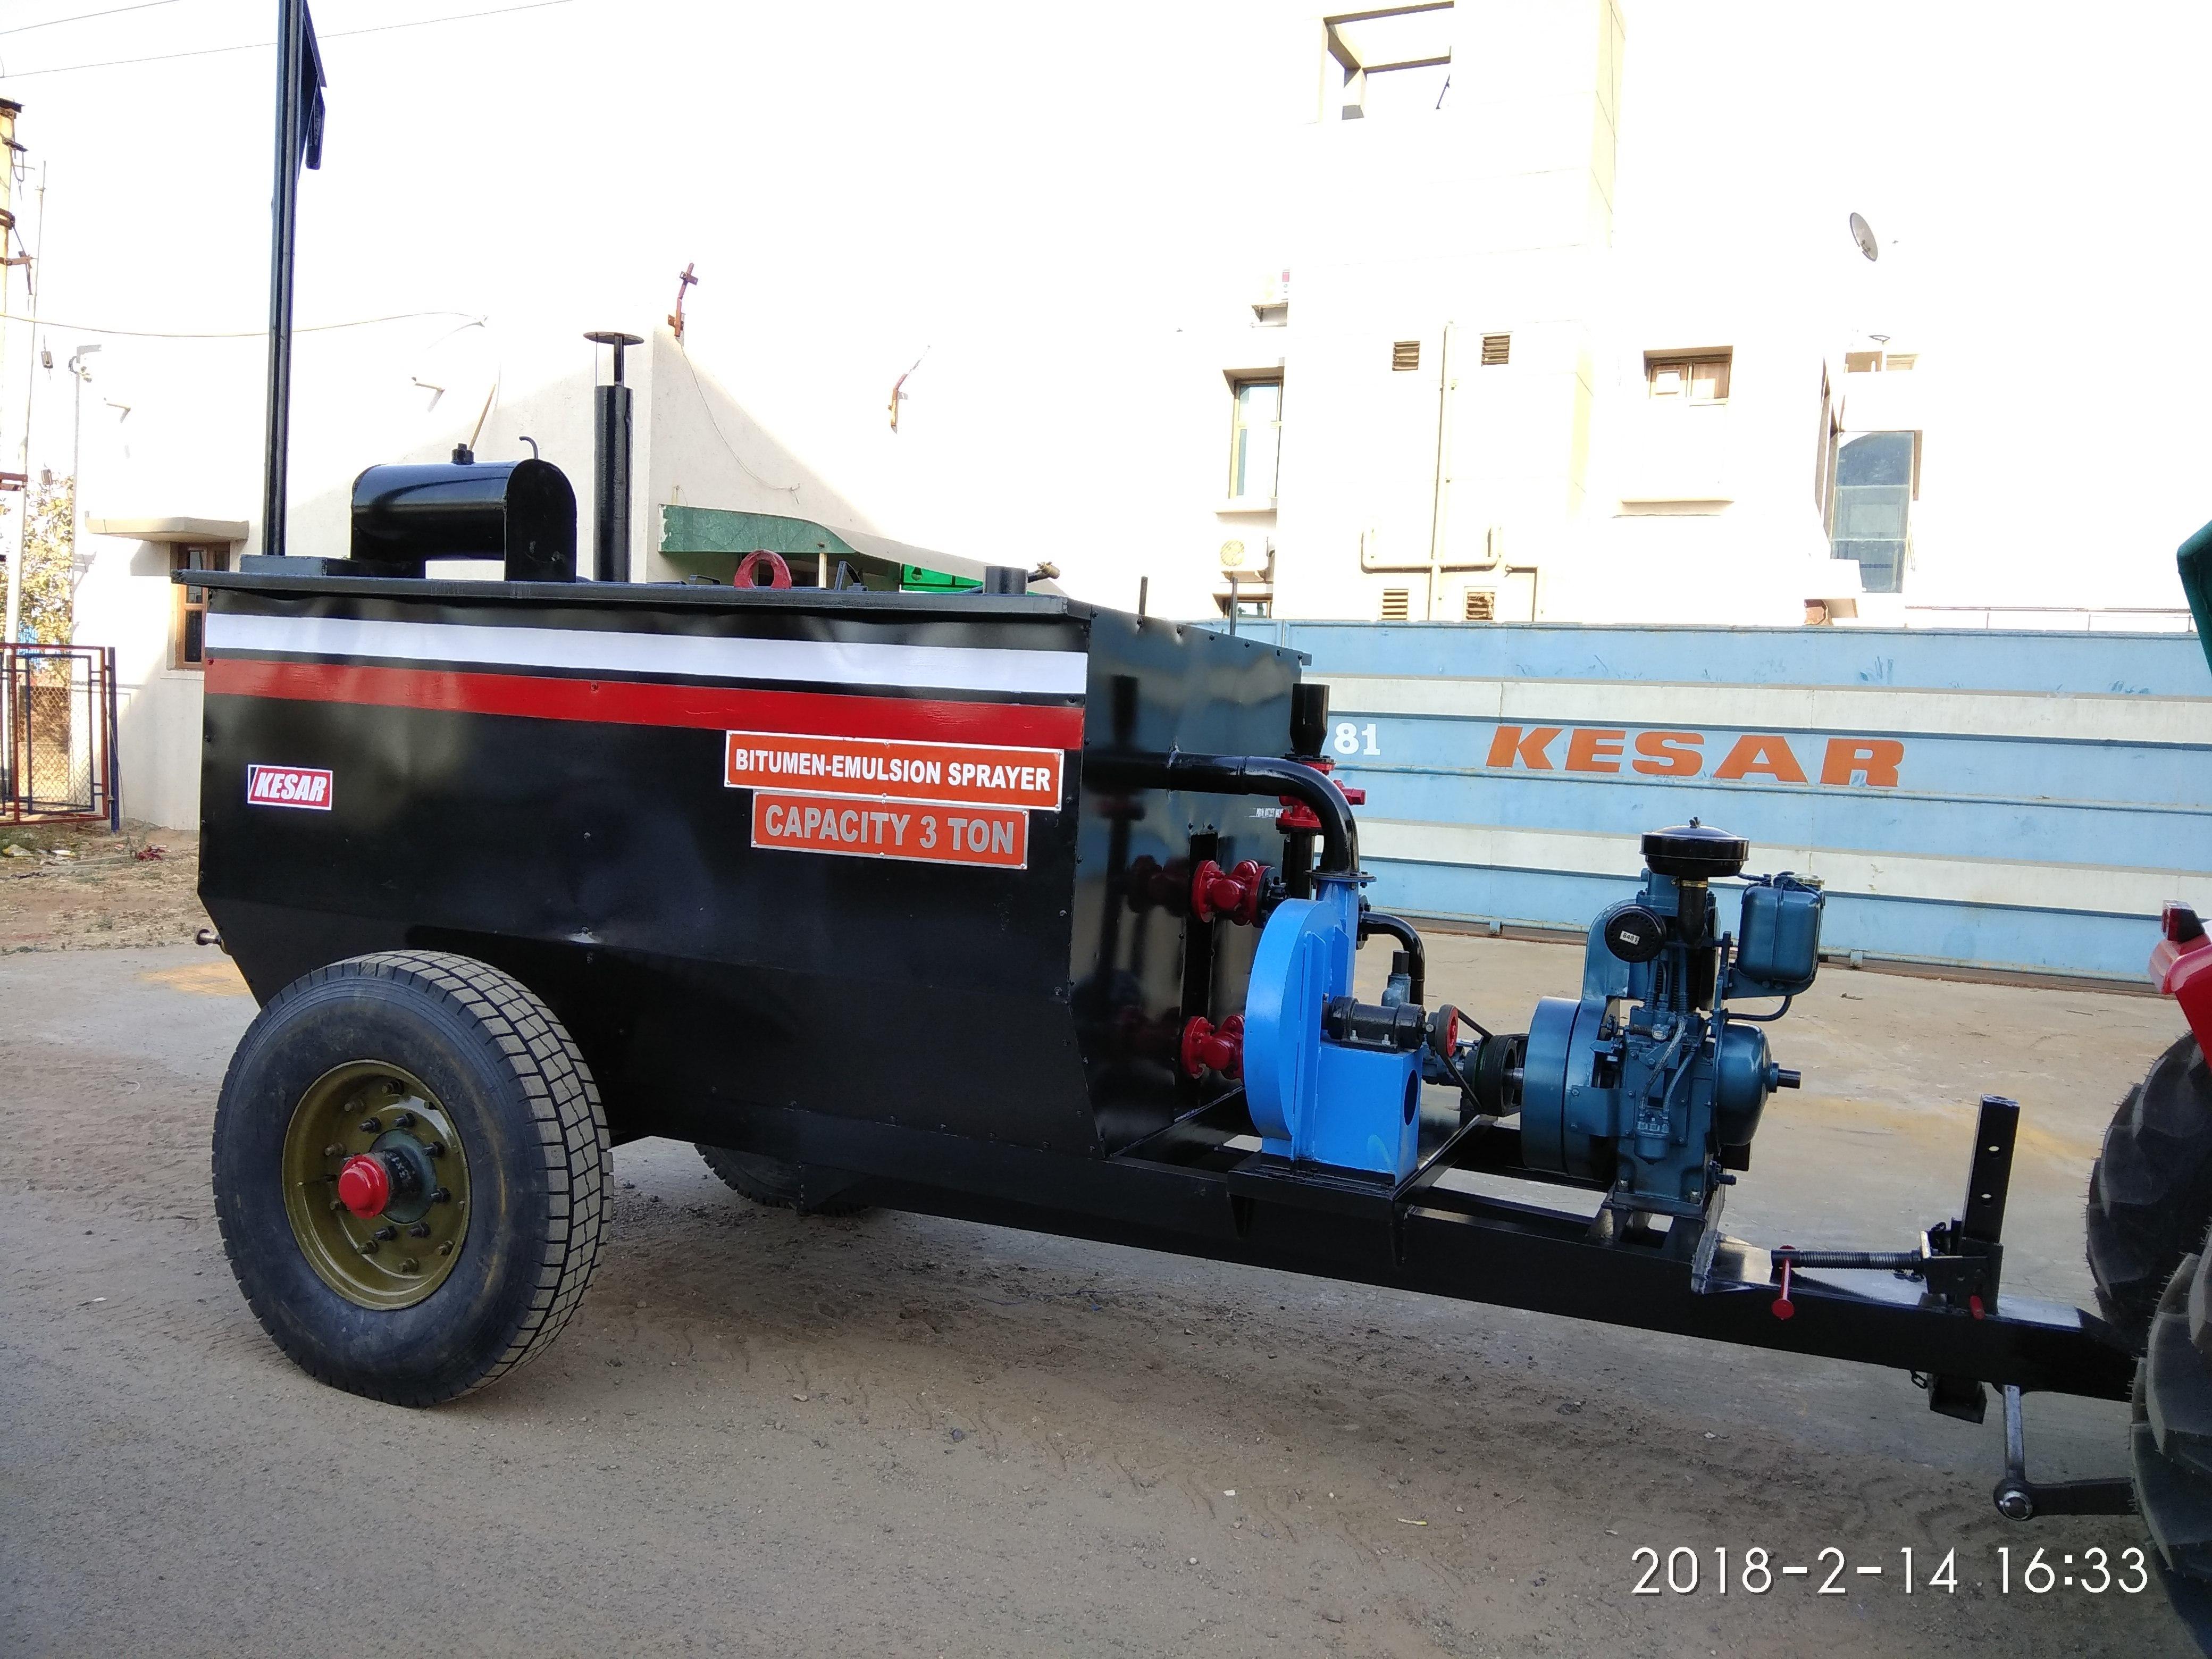 Tractor Mounted Bitumen Emulsion Sprayer